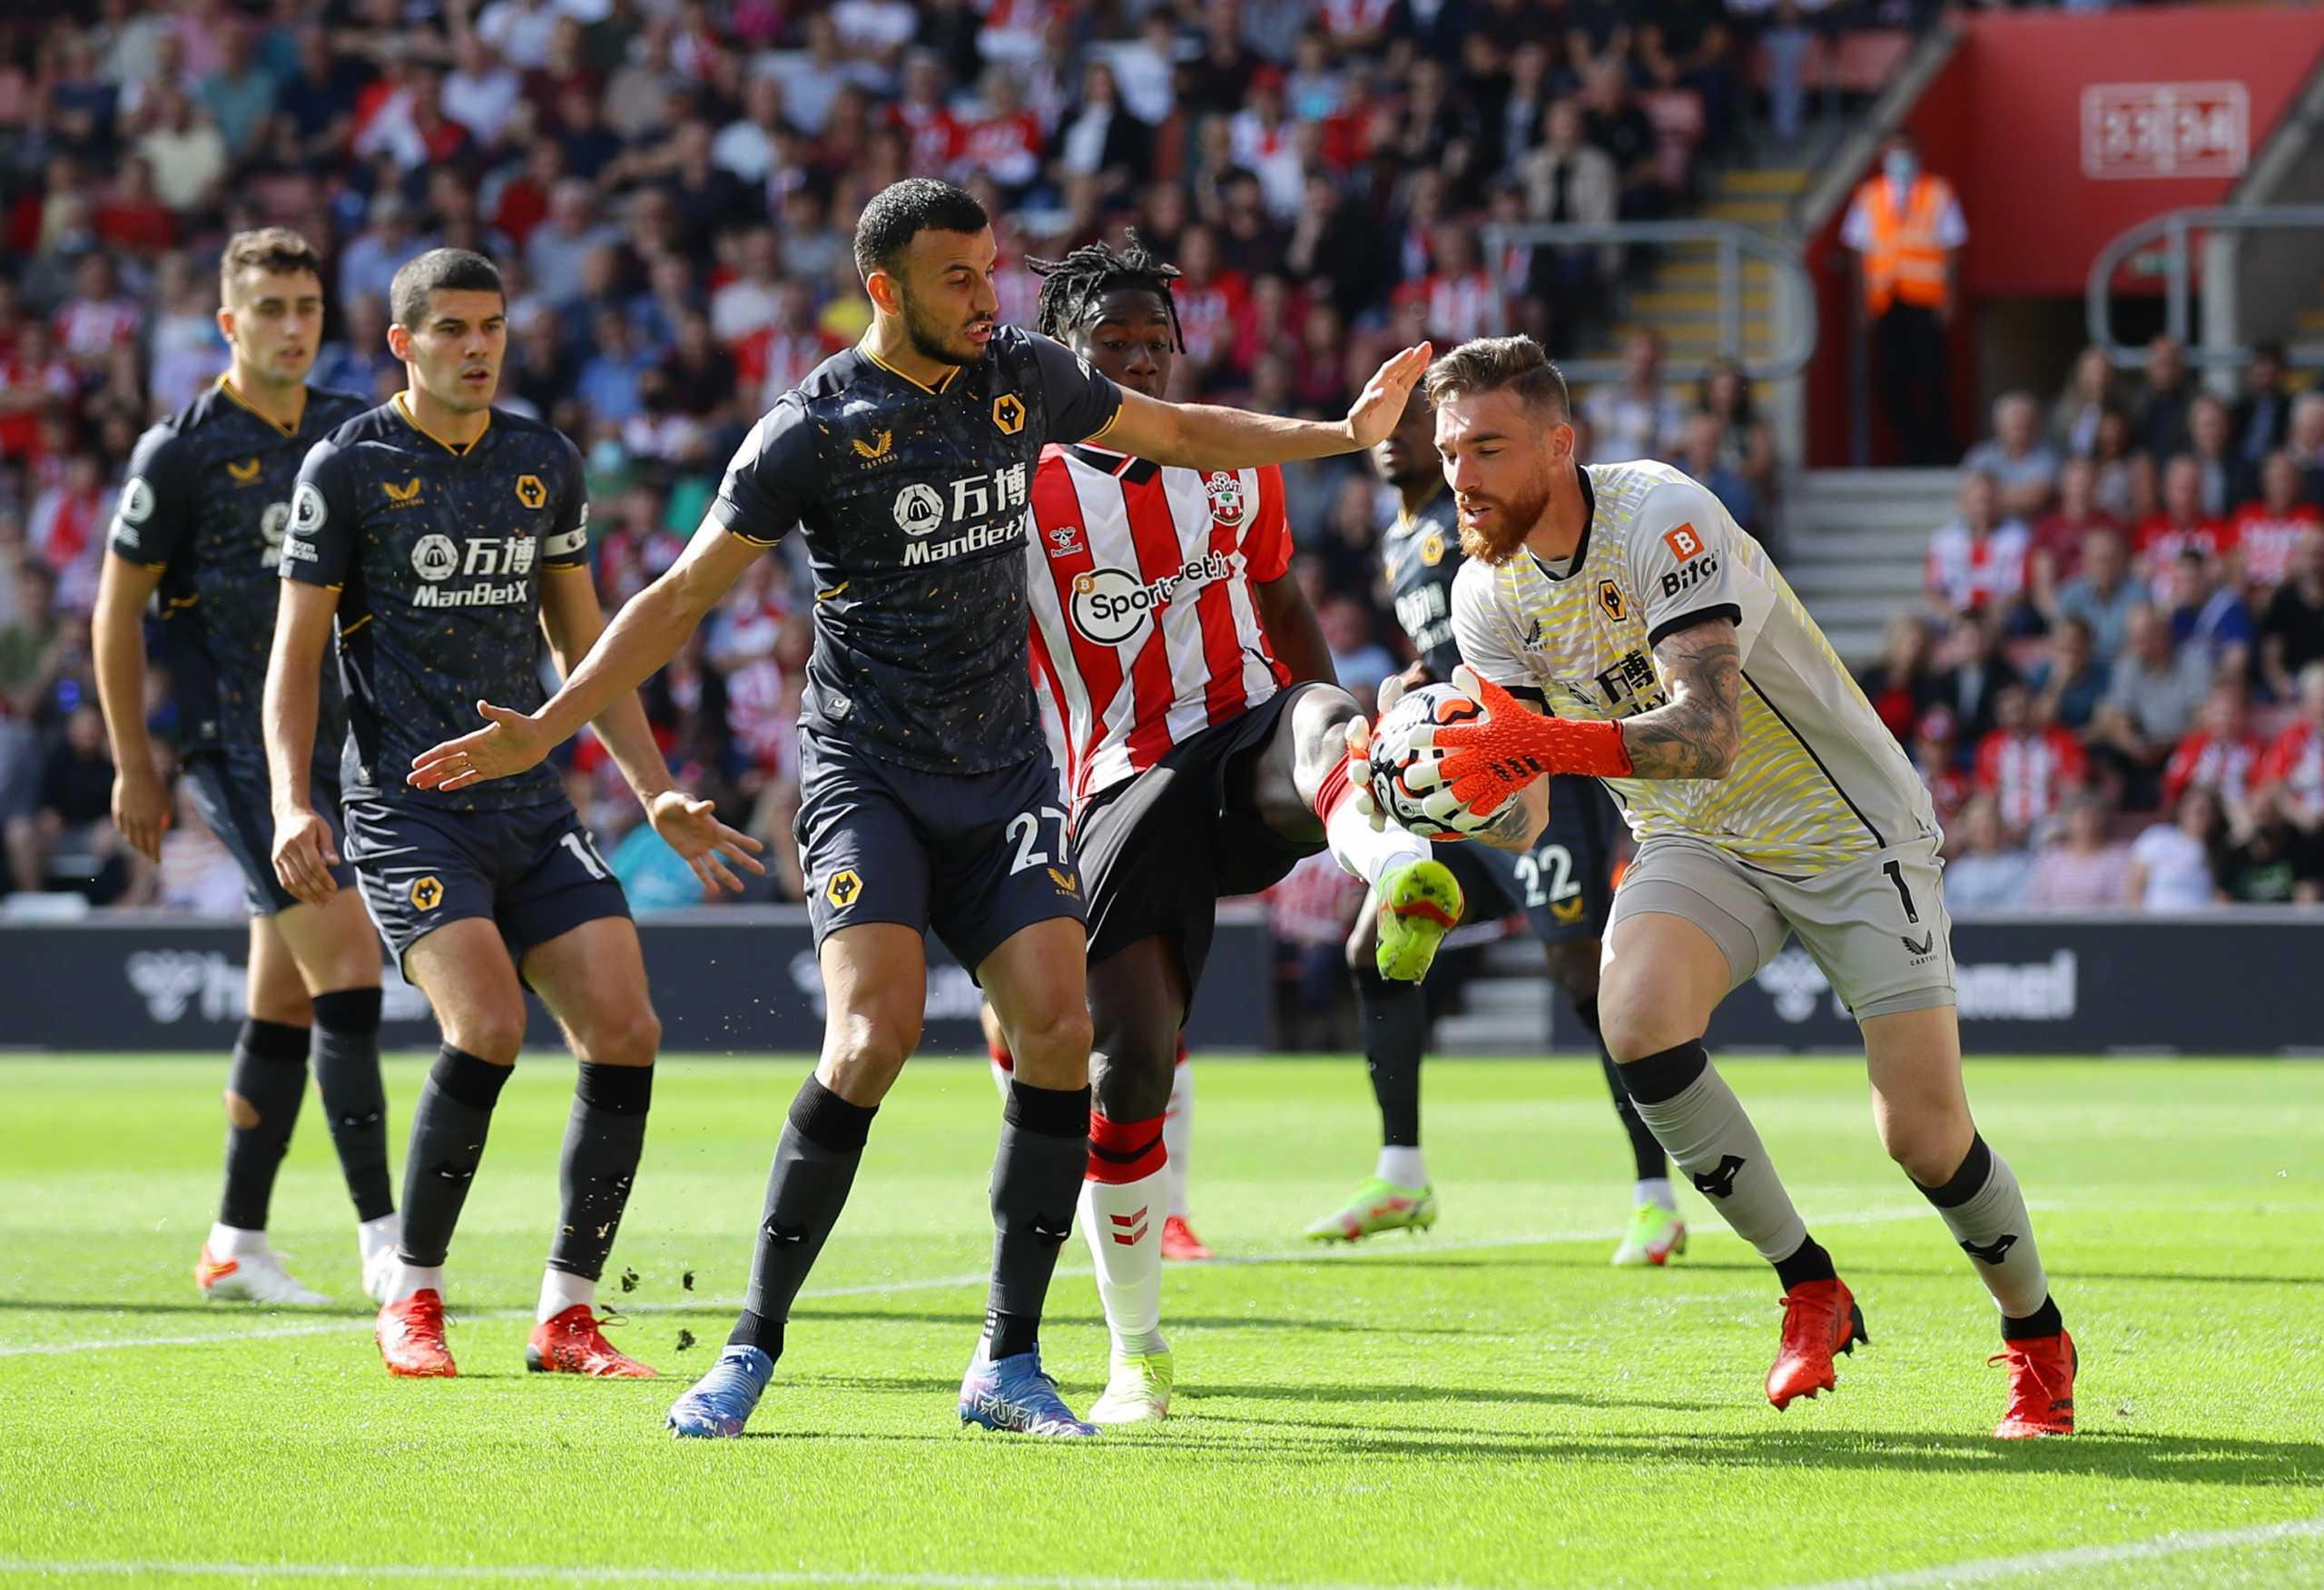 Premier League, Σαουθάμπτον – Γουλβς 0-1: Με Σα δημιουργό και Χιμένεθ εκτελεστή το διπλό